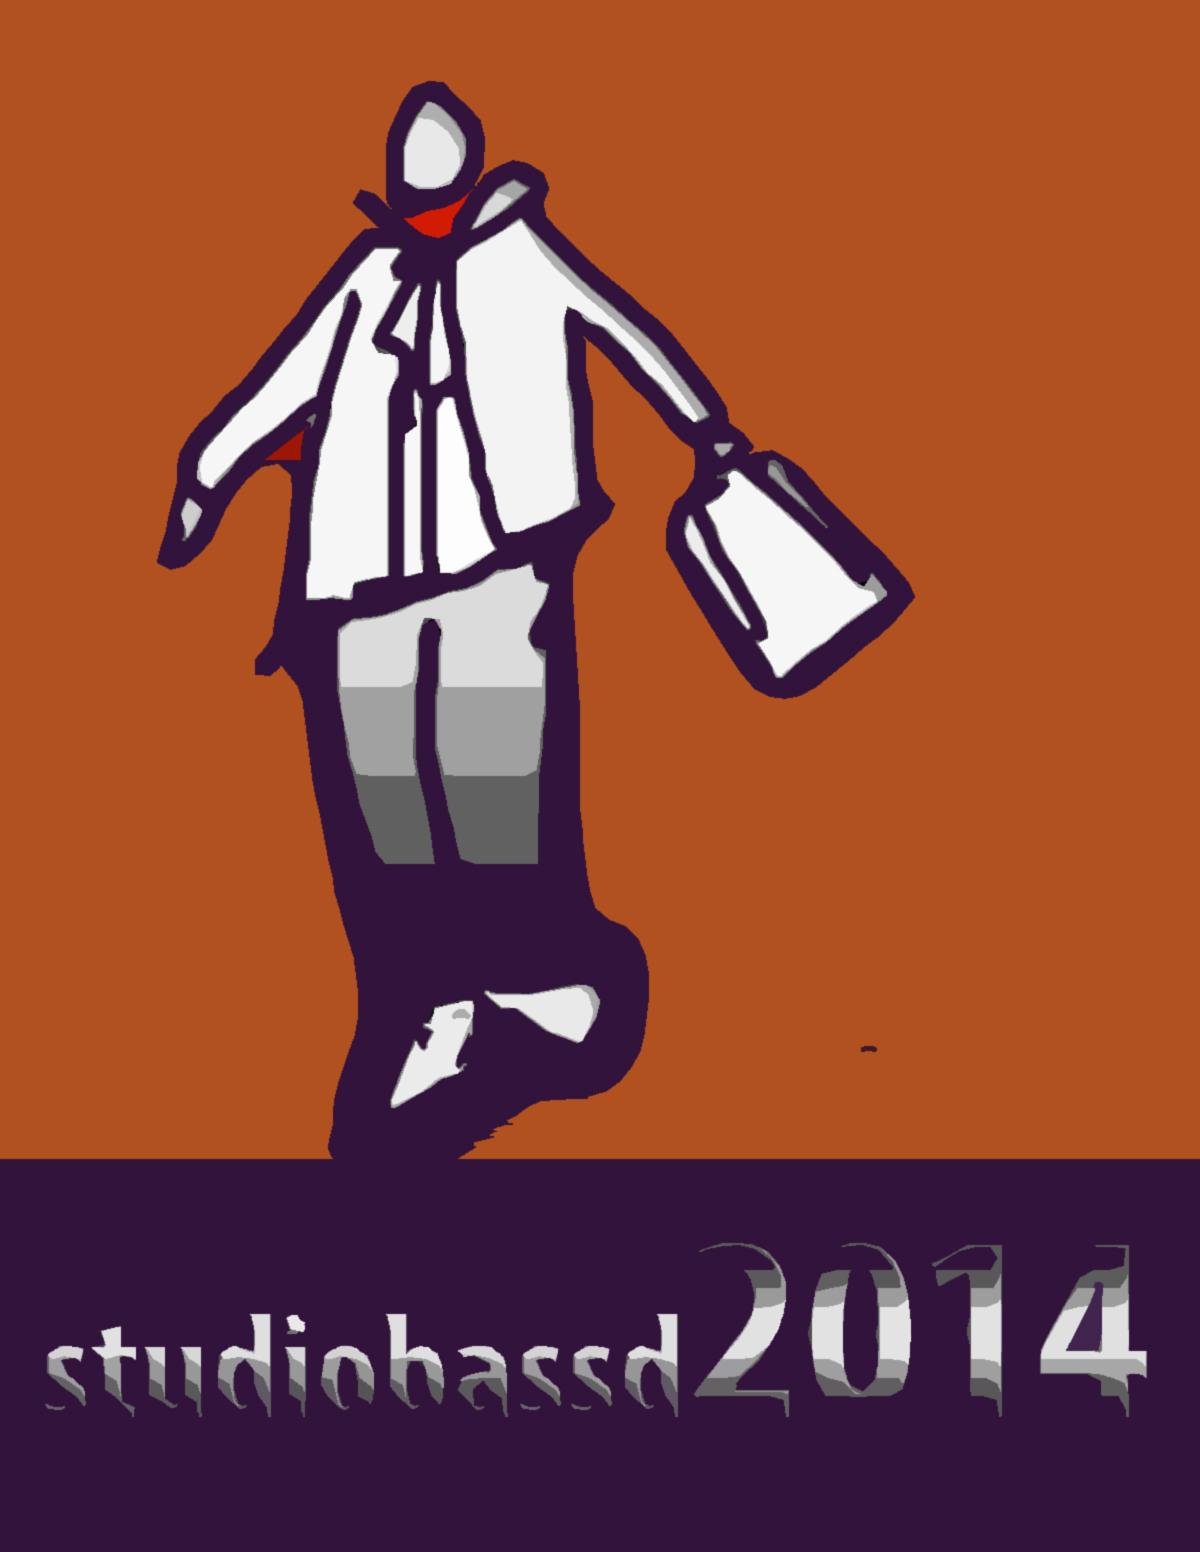 StudioBassD